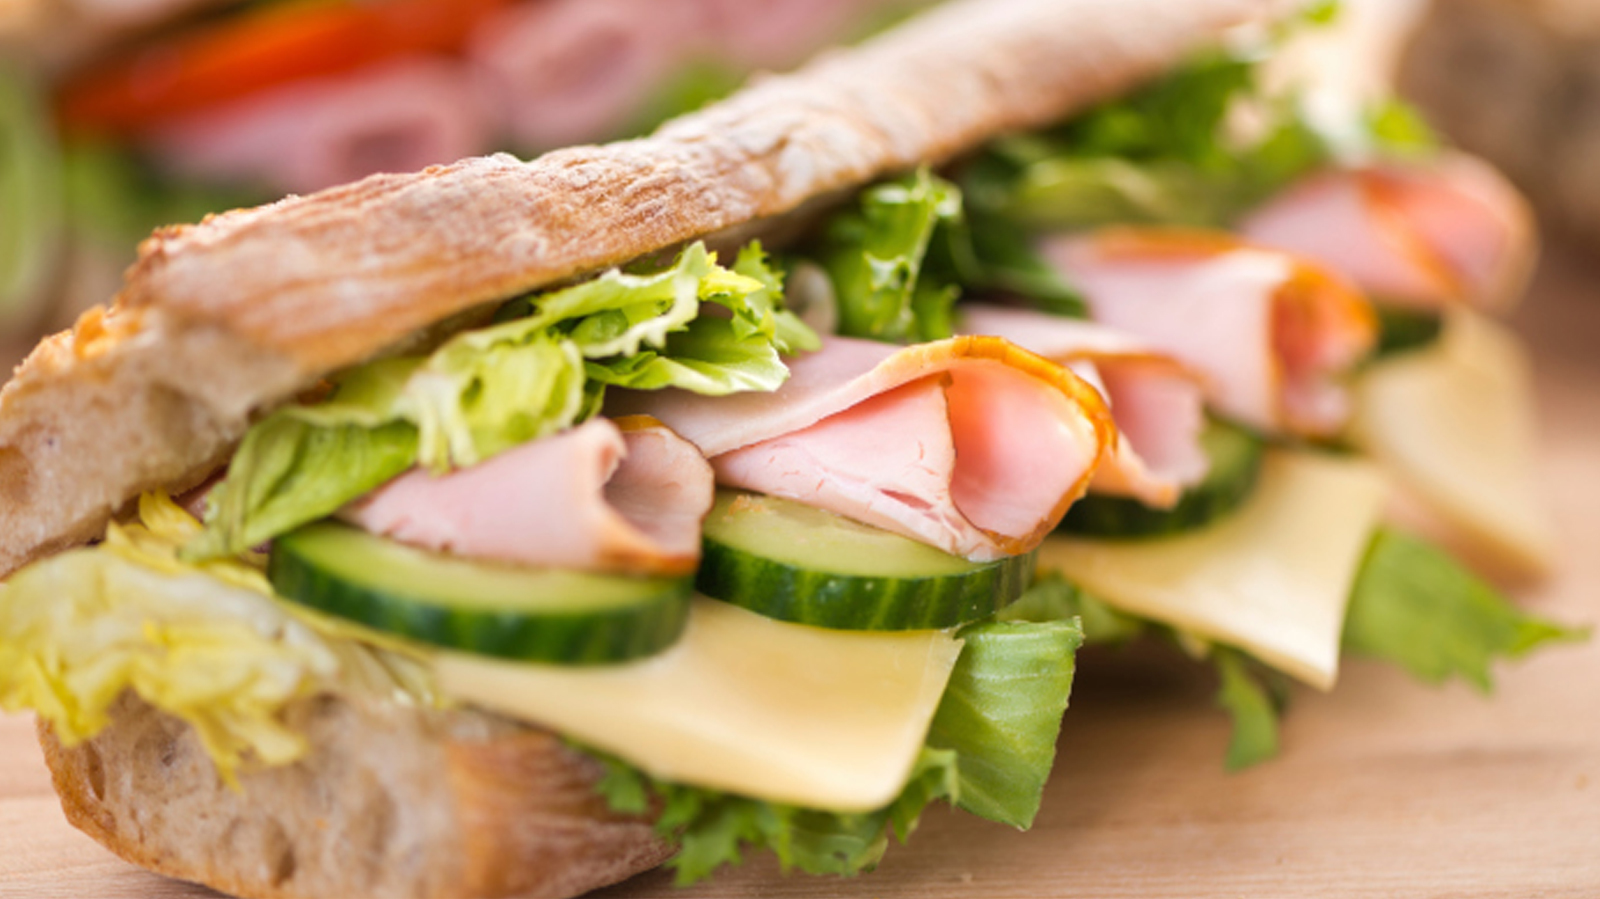 Get the fresh food advantage!